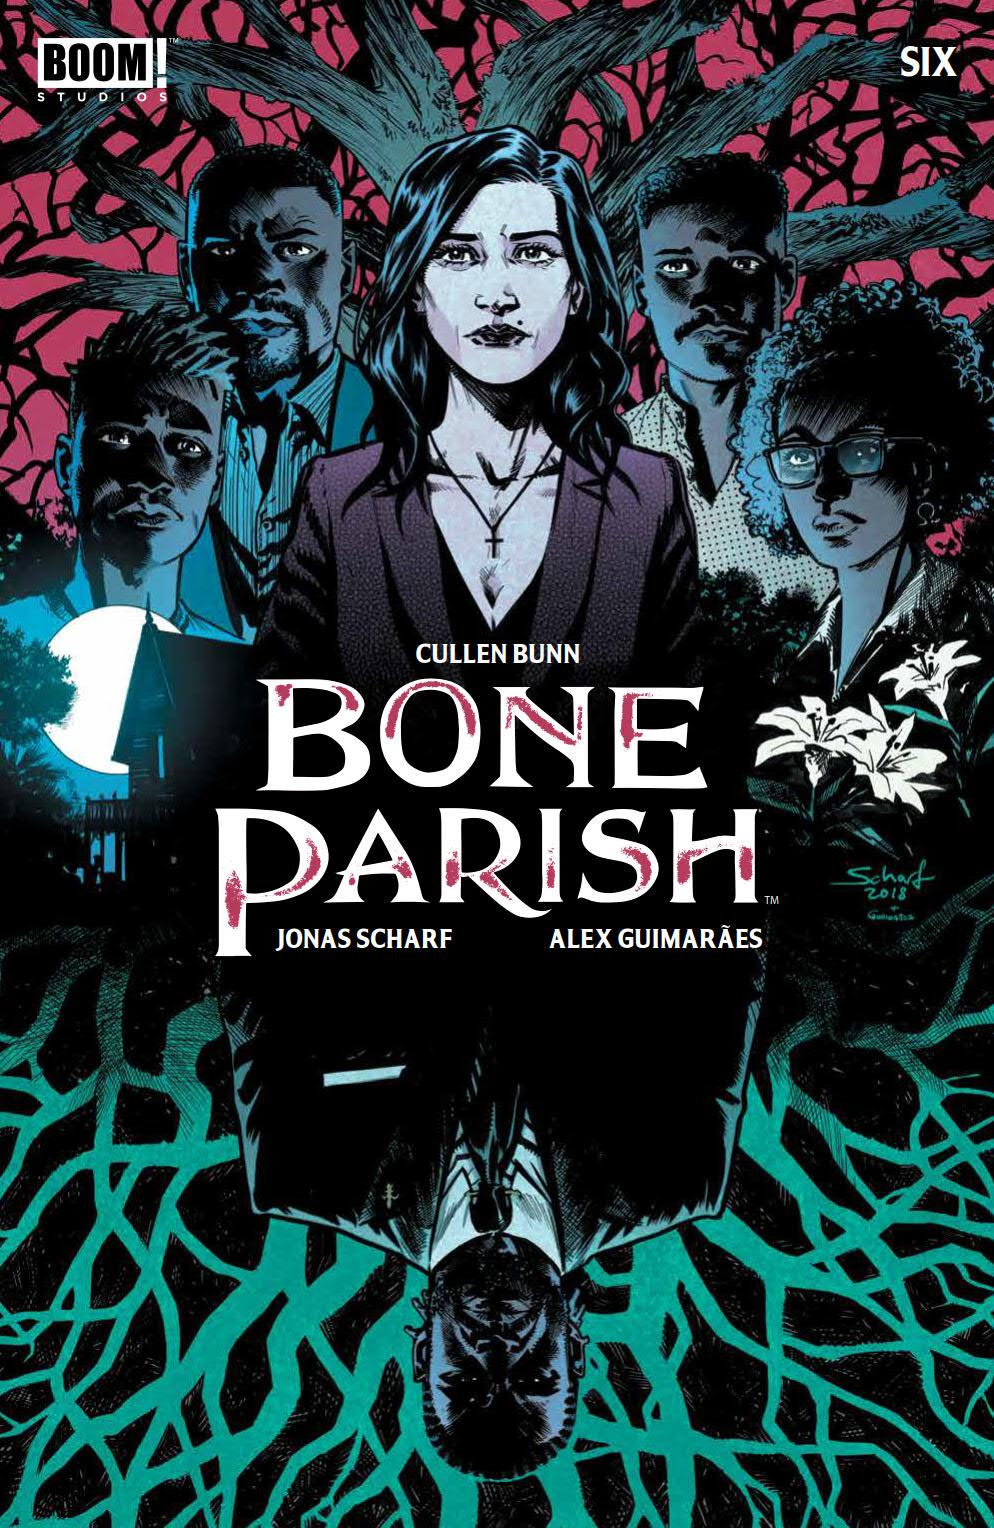 BoneParish_006_PRESS_1